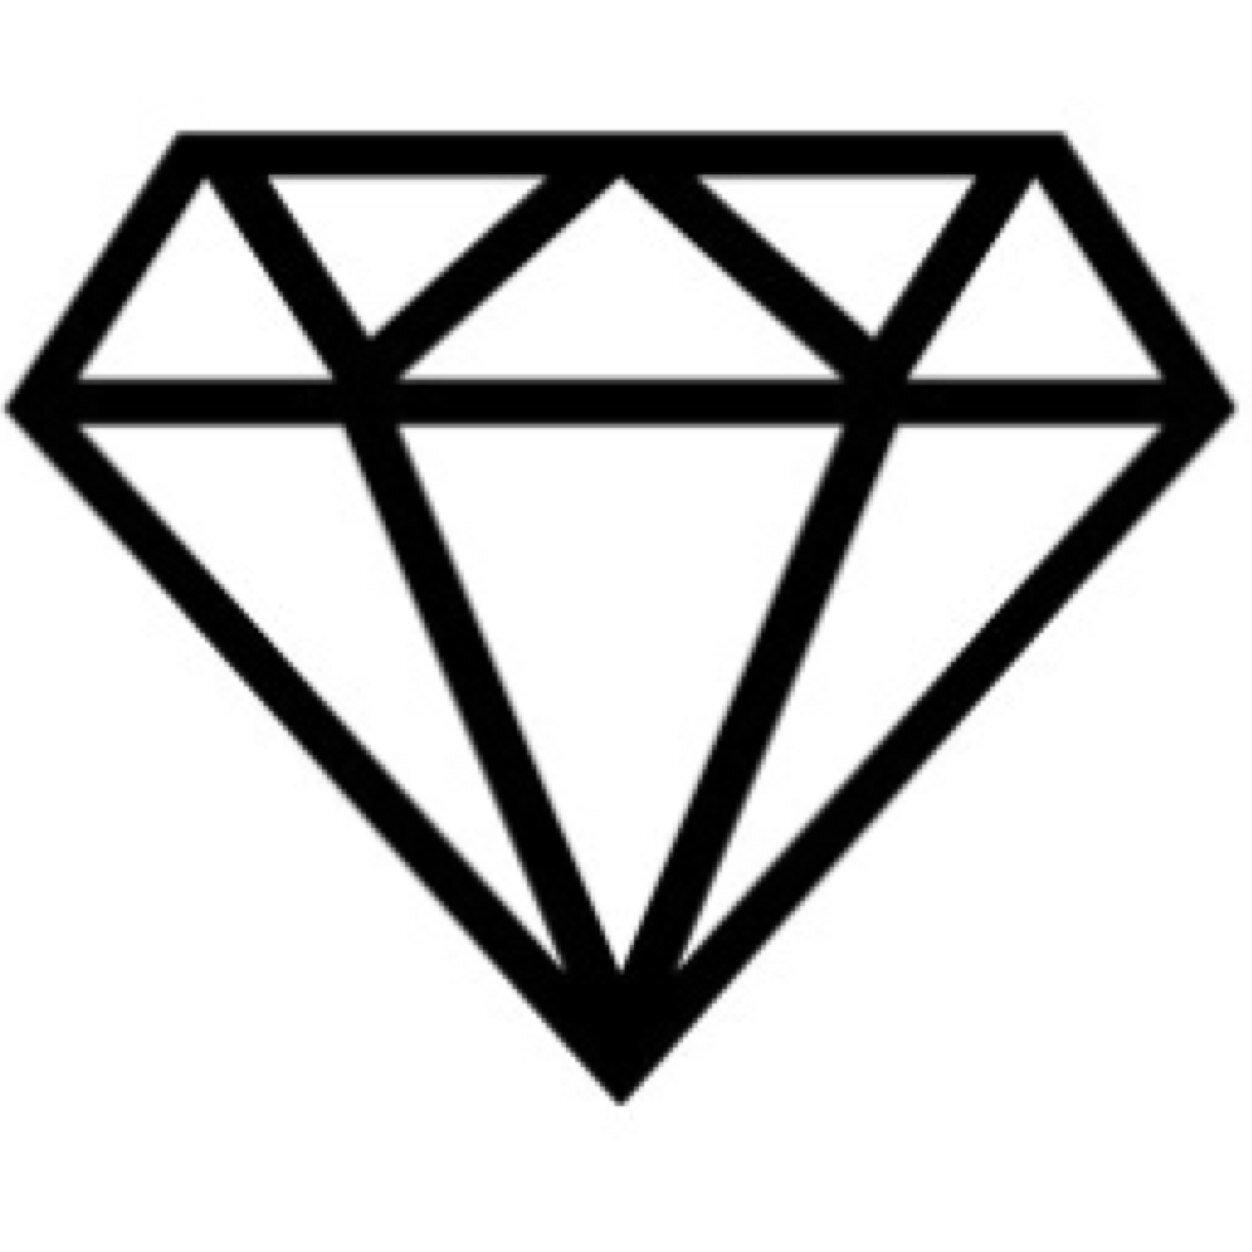 The diamond diet diamonddiet twitter the diamond diet buycottarizona Choice Image